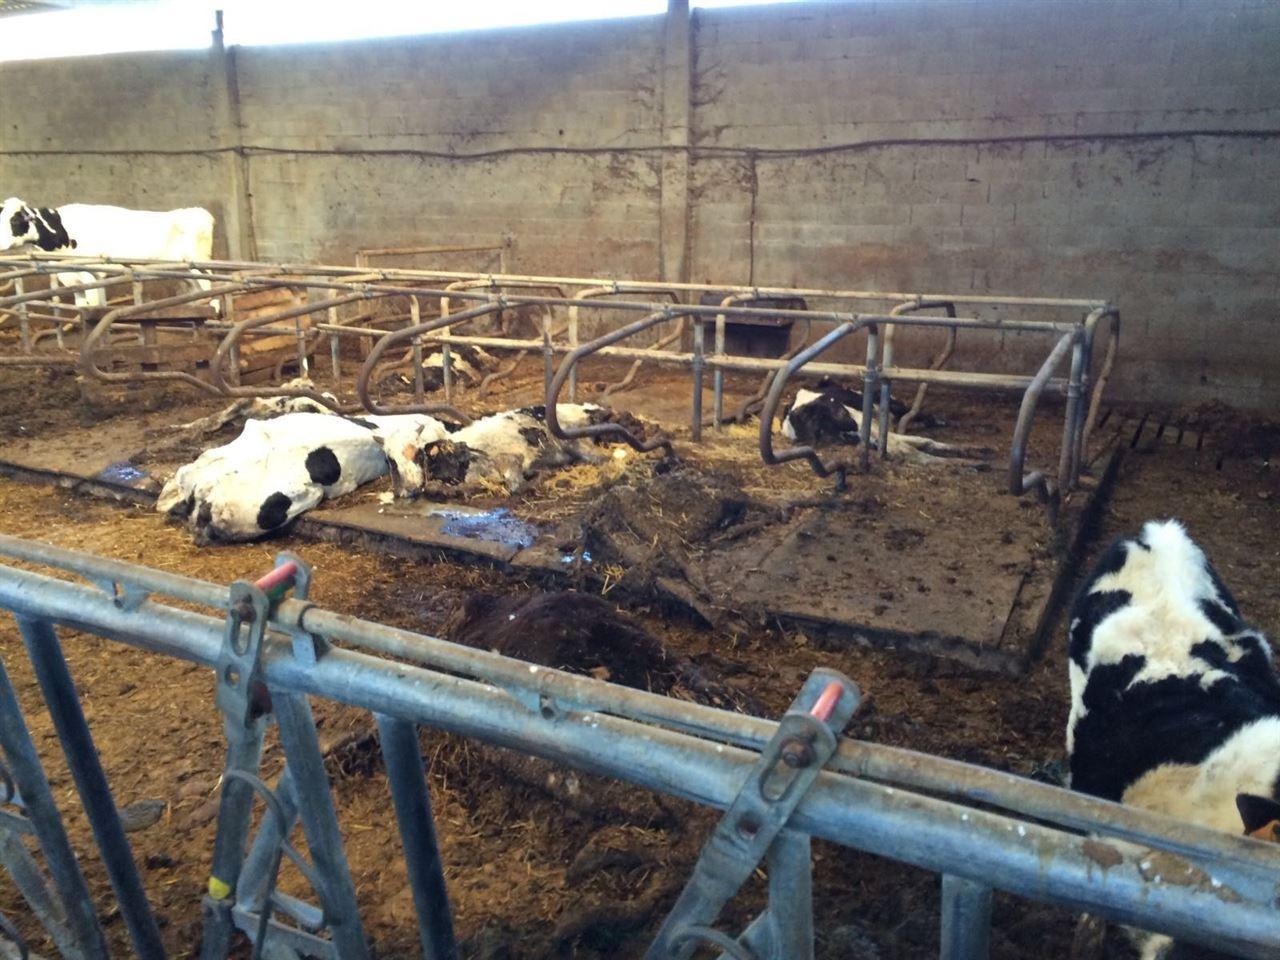 Chantada, 40 vacas muertas, ¿maltrato animal o problemas económicos?